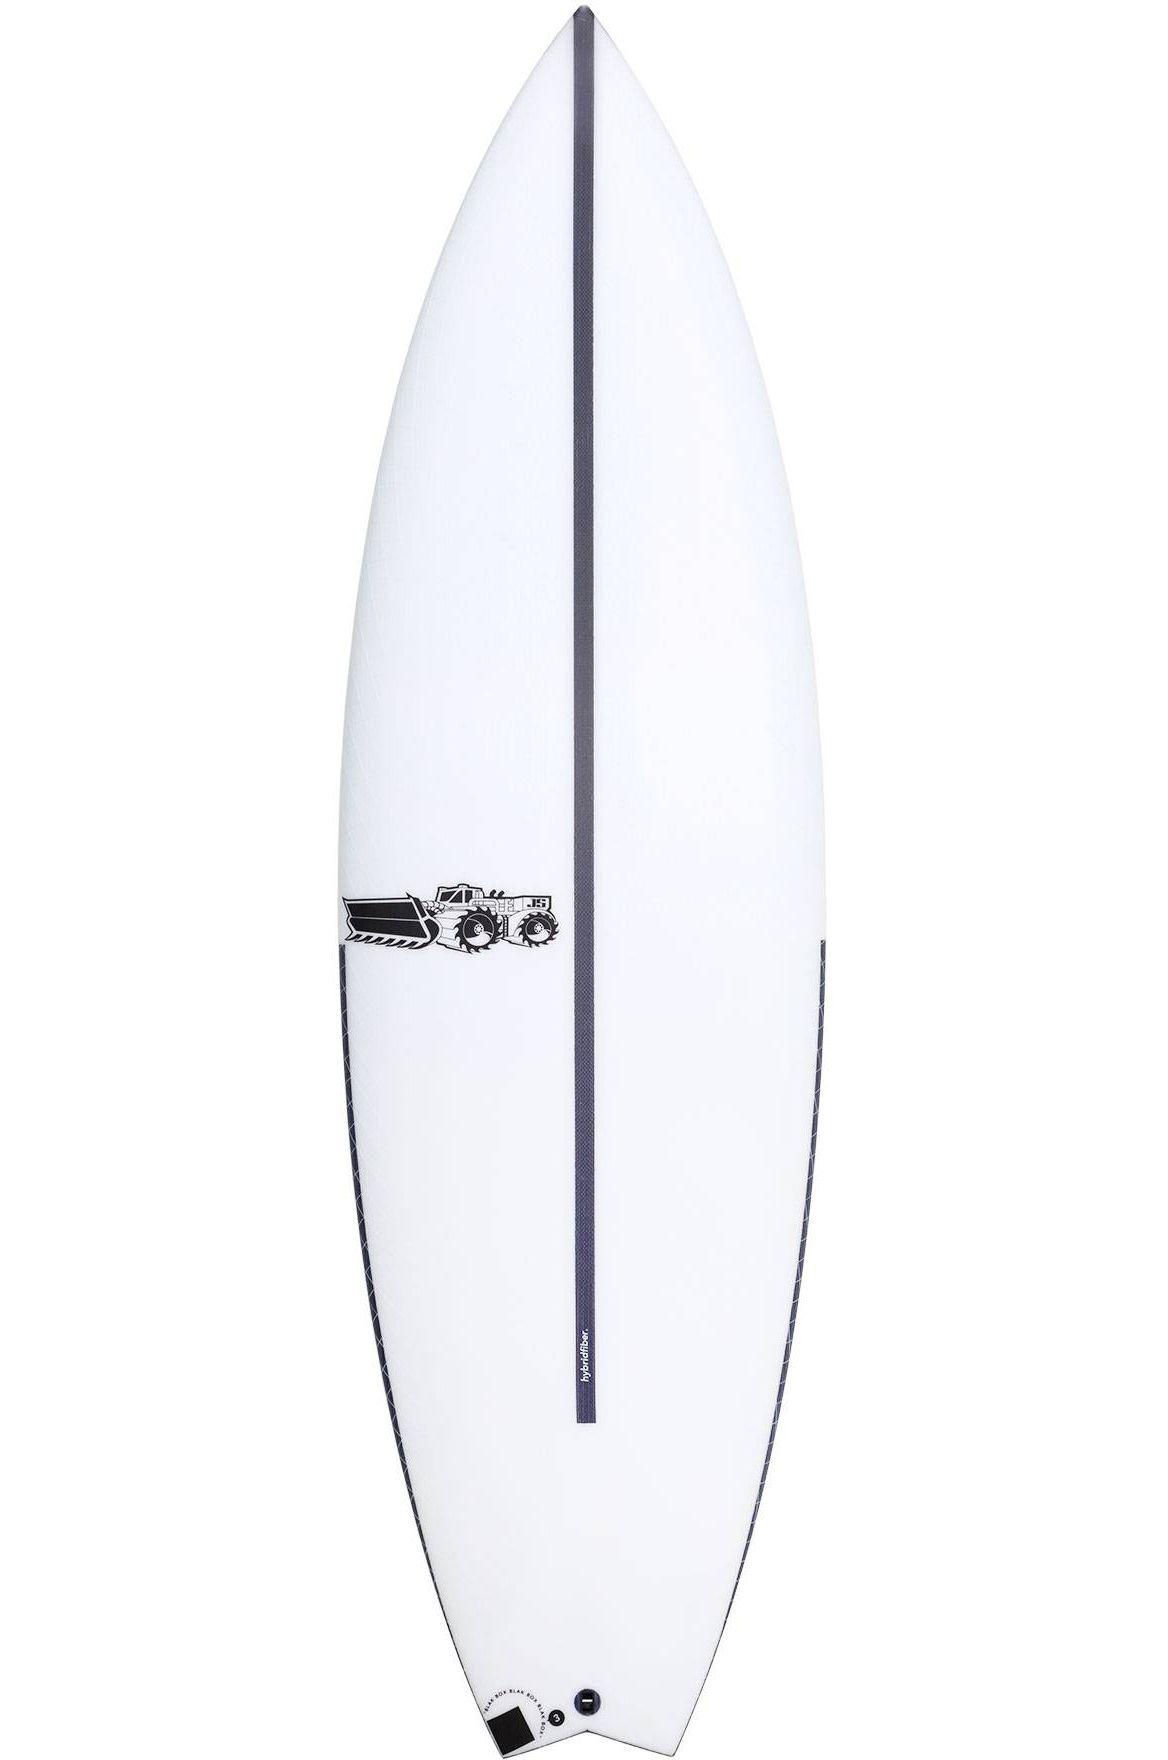 Prancha Surf JS 5'8 BLAK BOX 3 HYFI Swallow Tail - Color FCS II Multisystem 5ft8